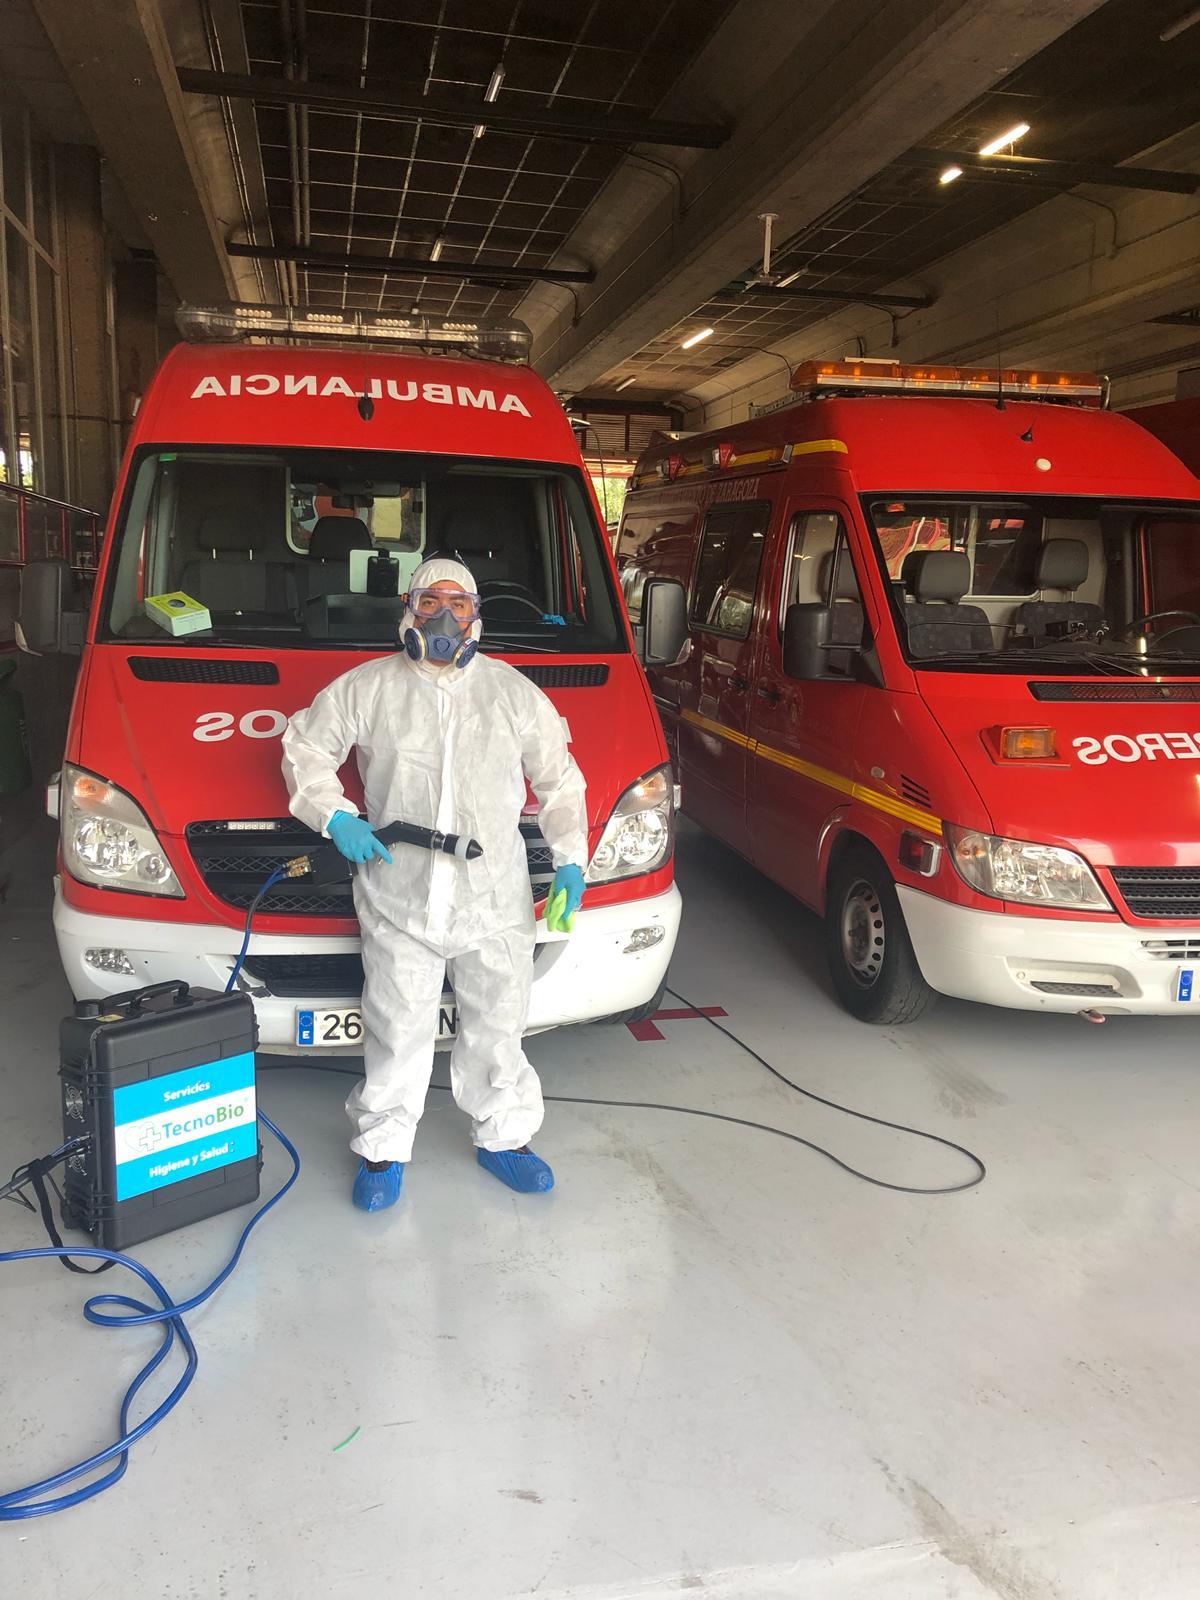 desinfeccion corovirus ambulancias